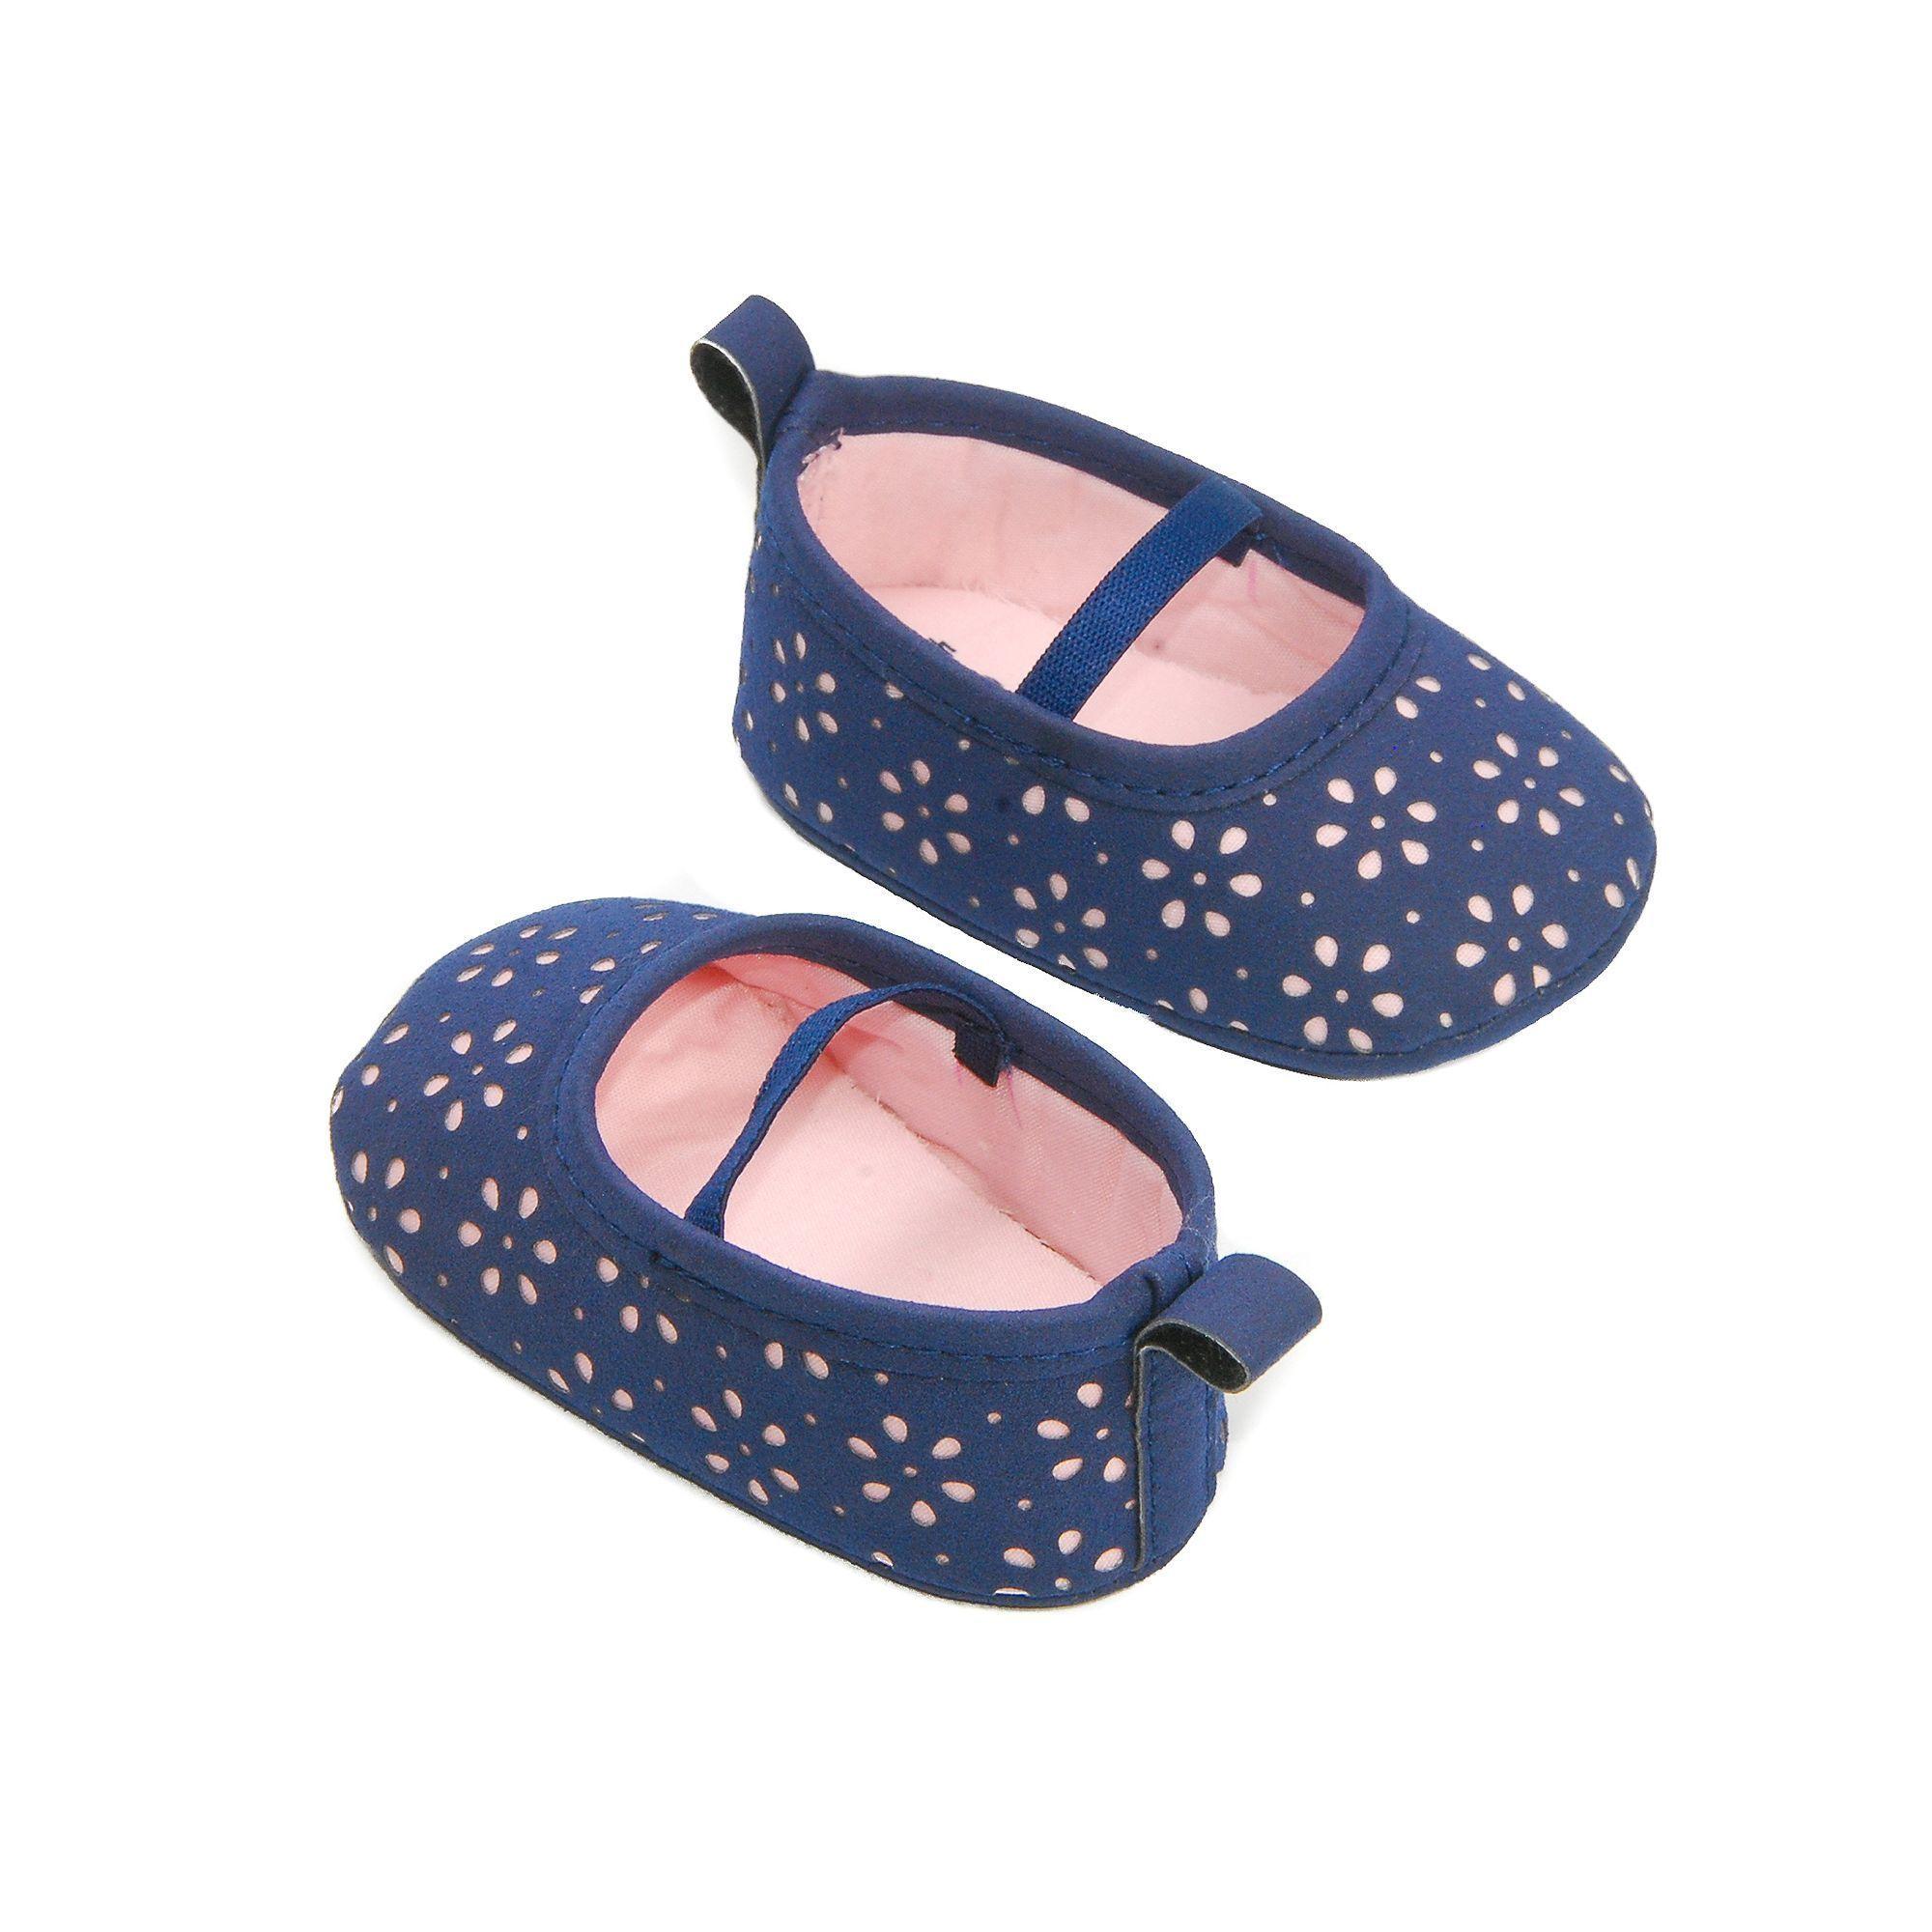 pin i shoes crib belgium toms cribs adidas superstar floral